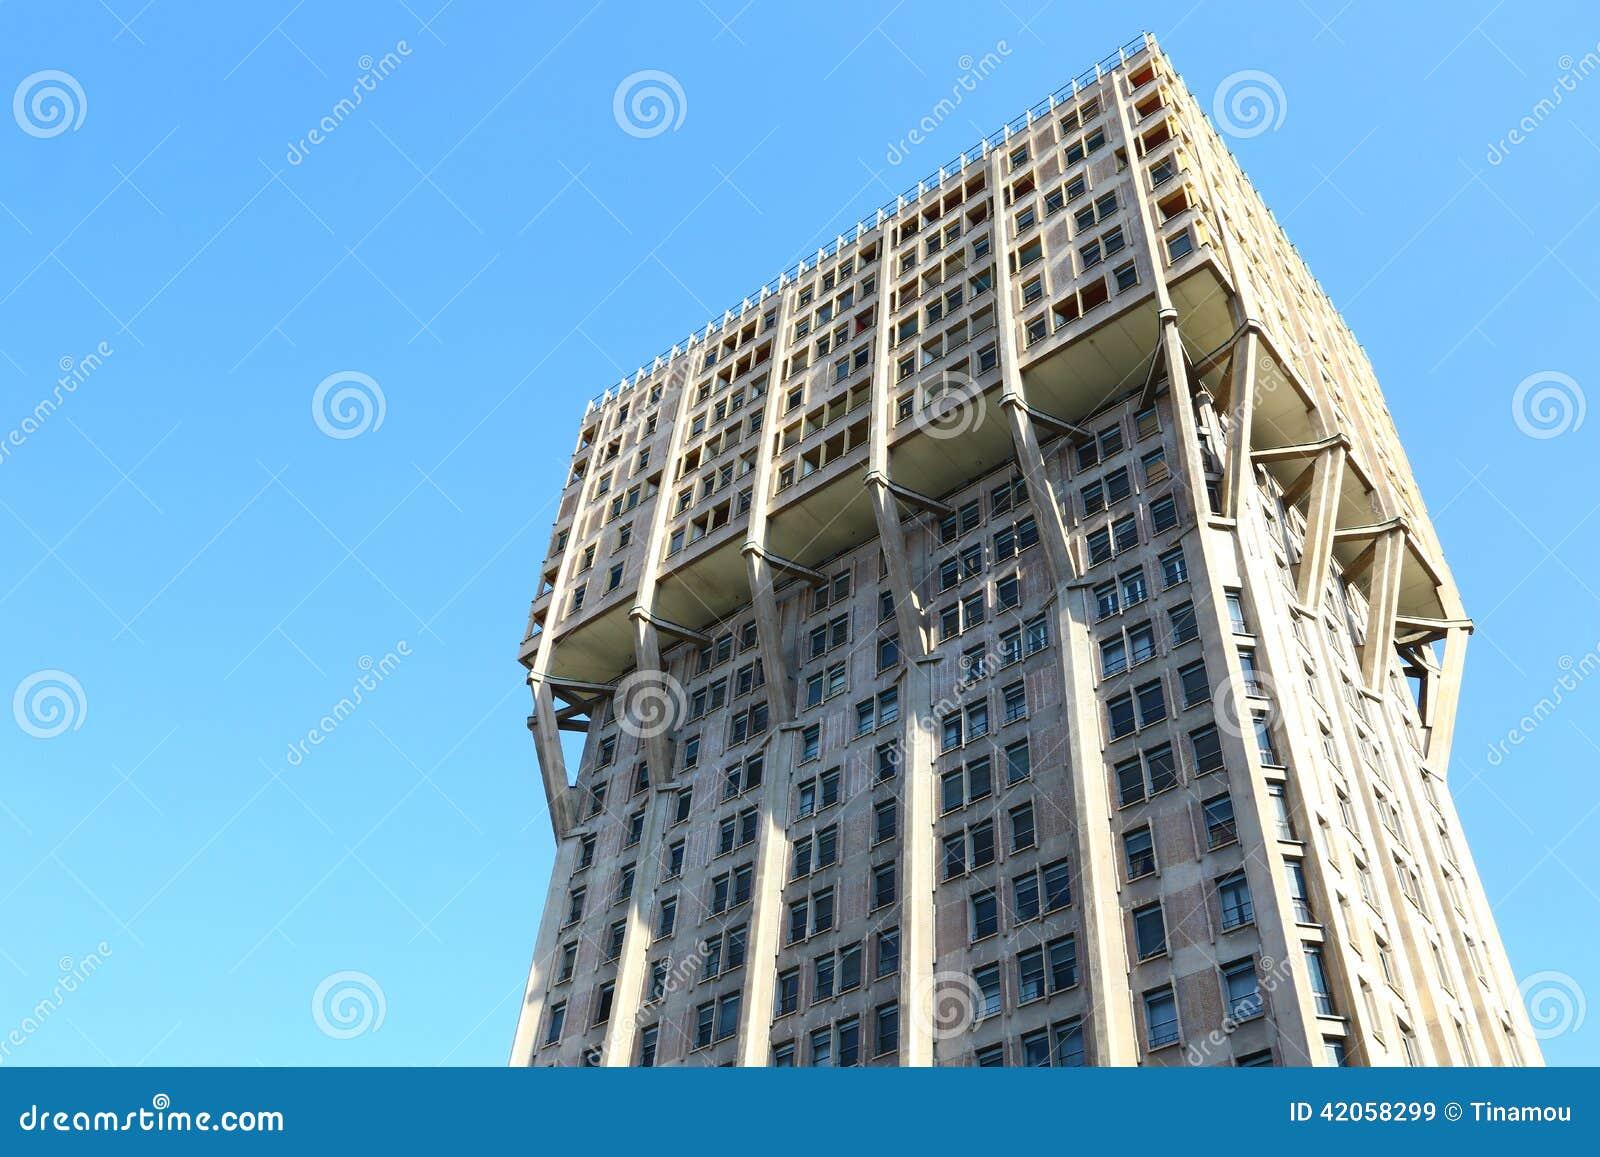 Turm velasca in mailand italien stockfoto bild 42058299 for Architektur mailand